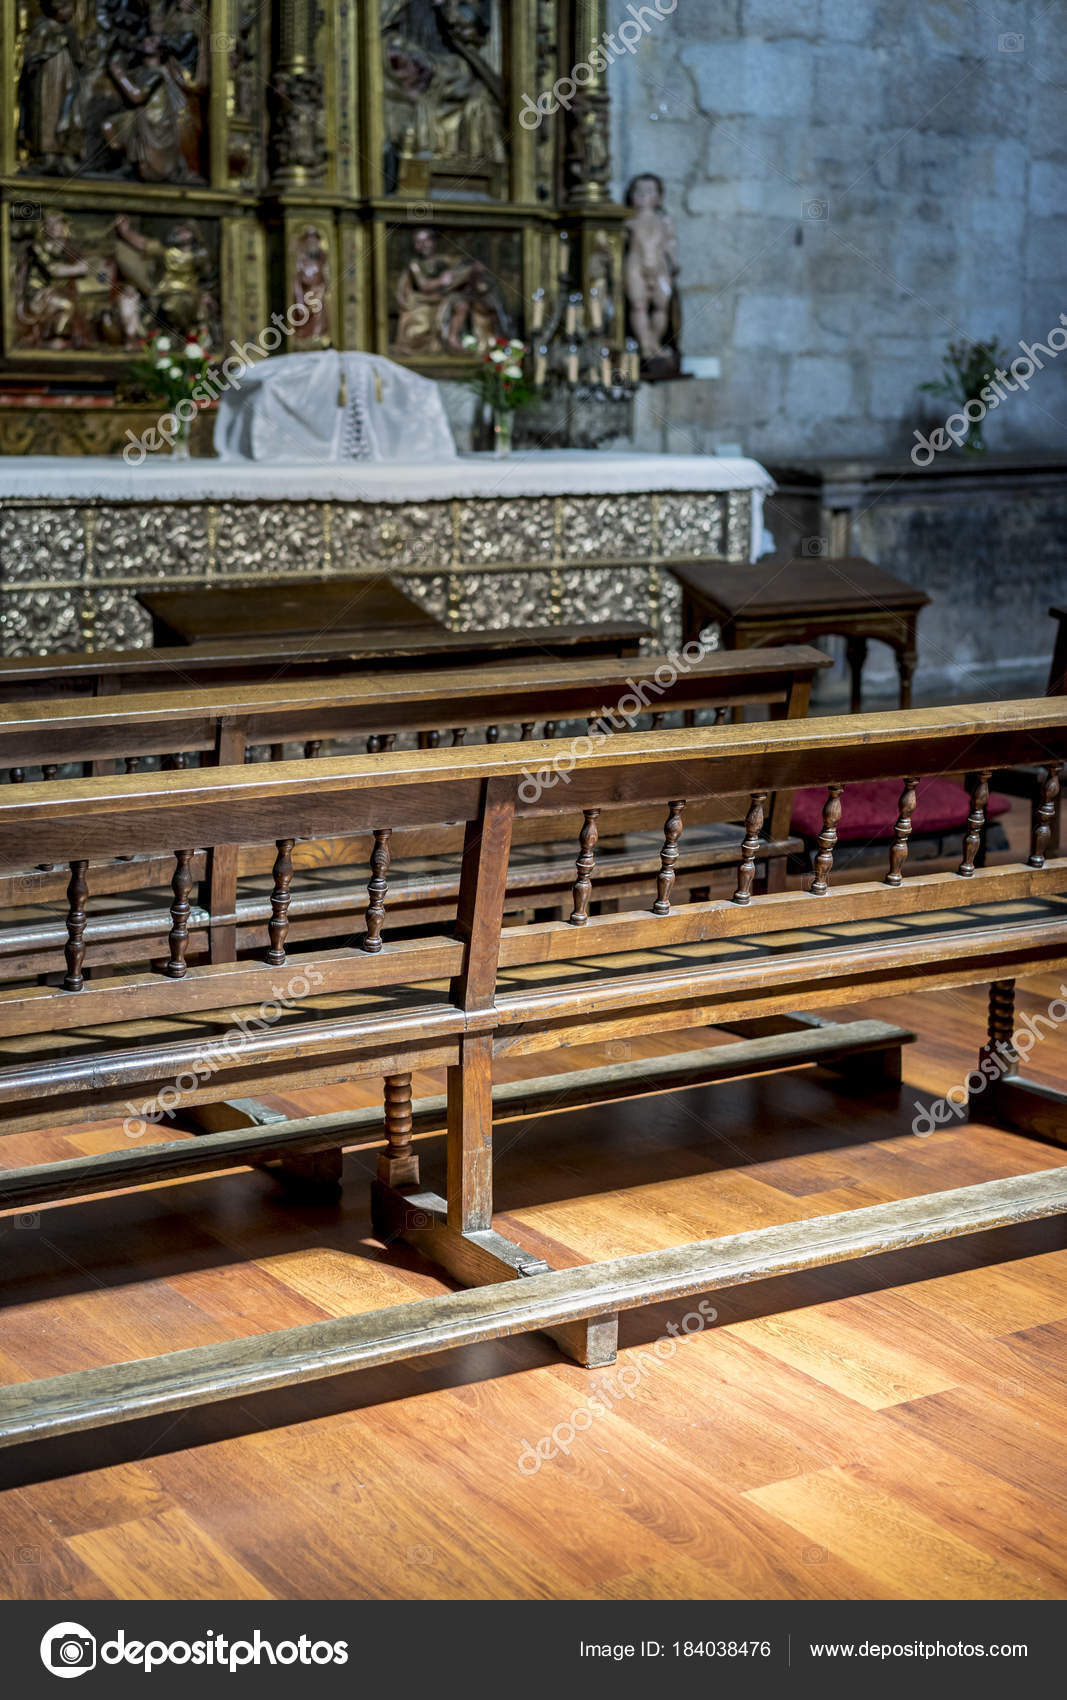 Stupendous Vintage Benches Pray Church Concept Faith Religion Stock Camellatalisay Diy Chair Ideas Camellatalisaycom